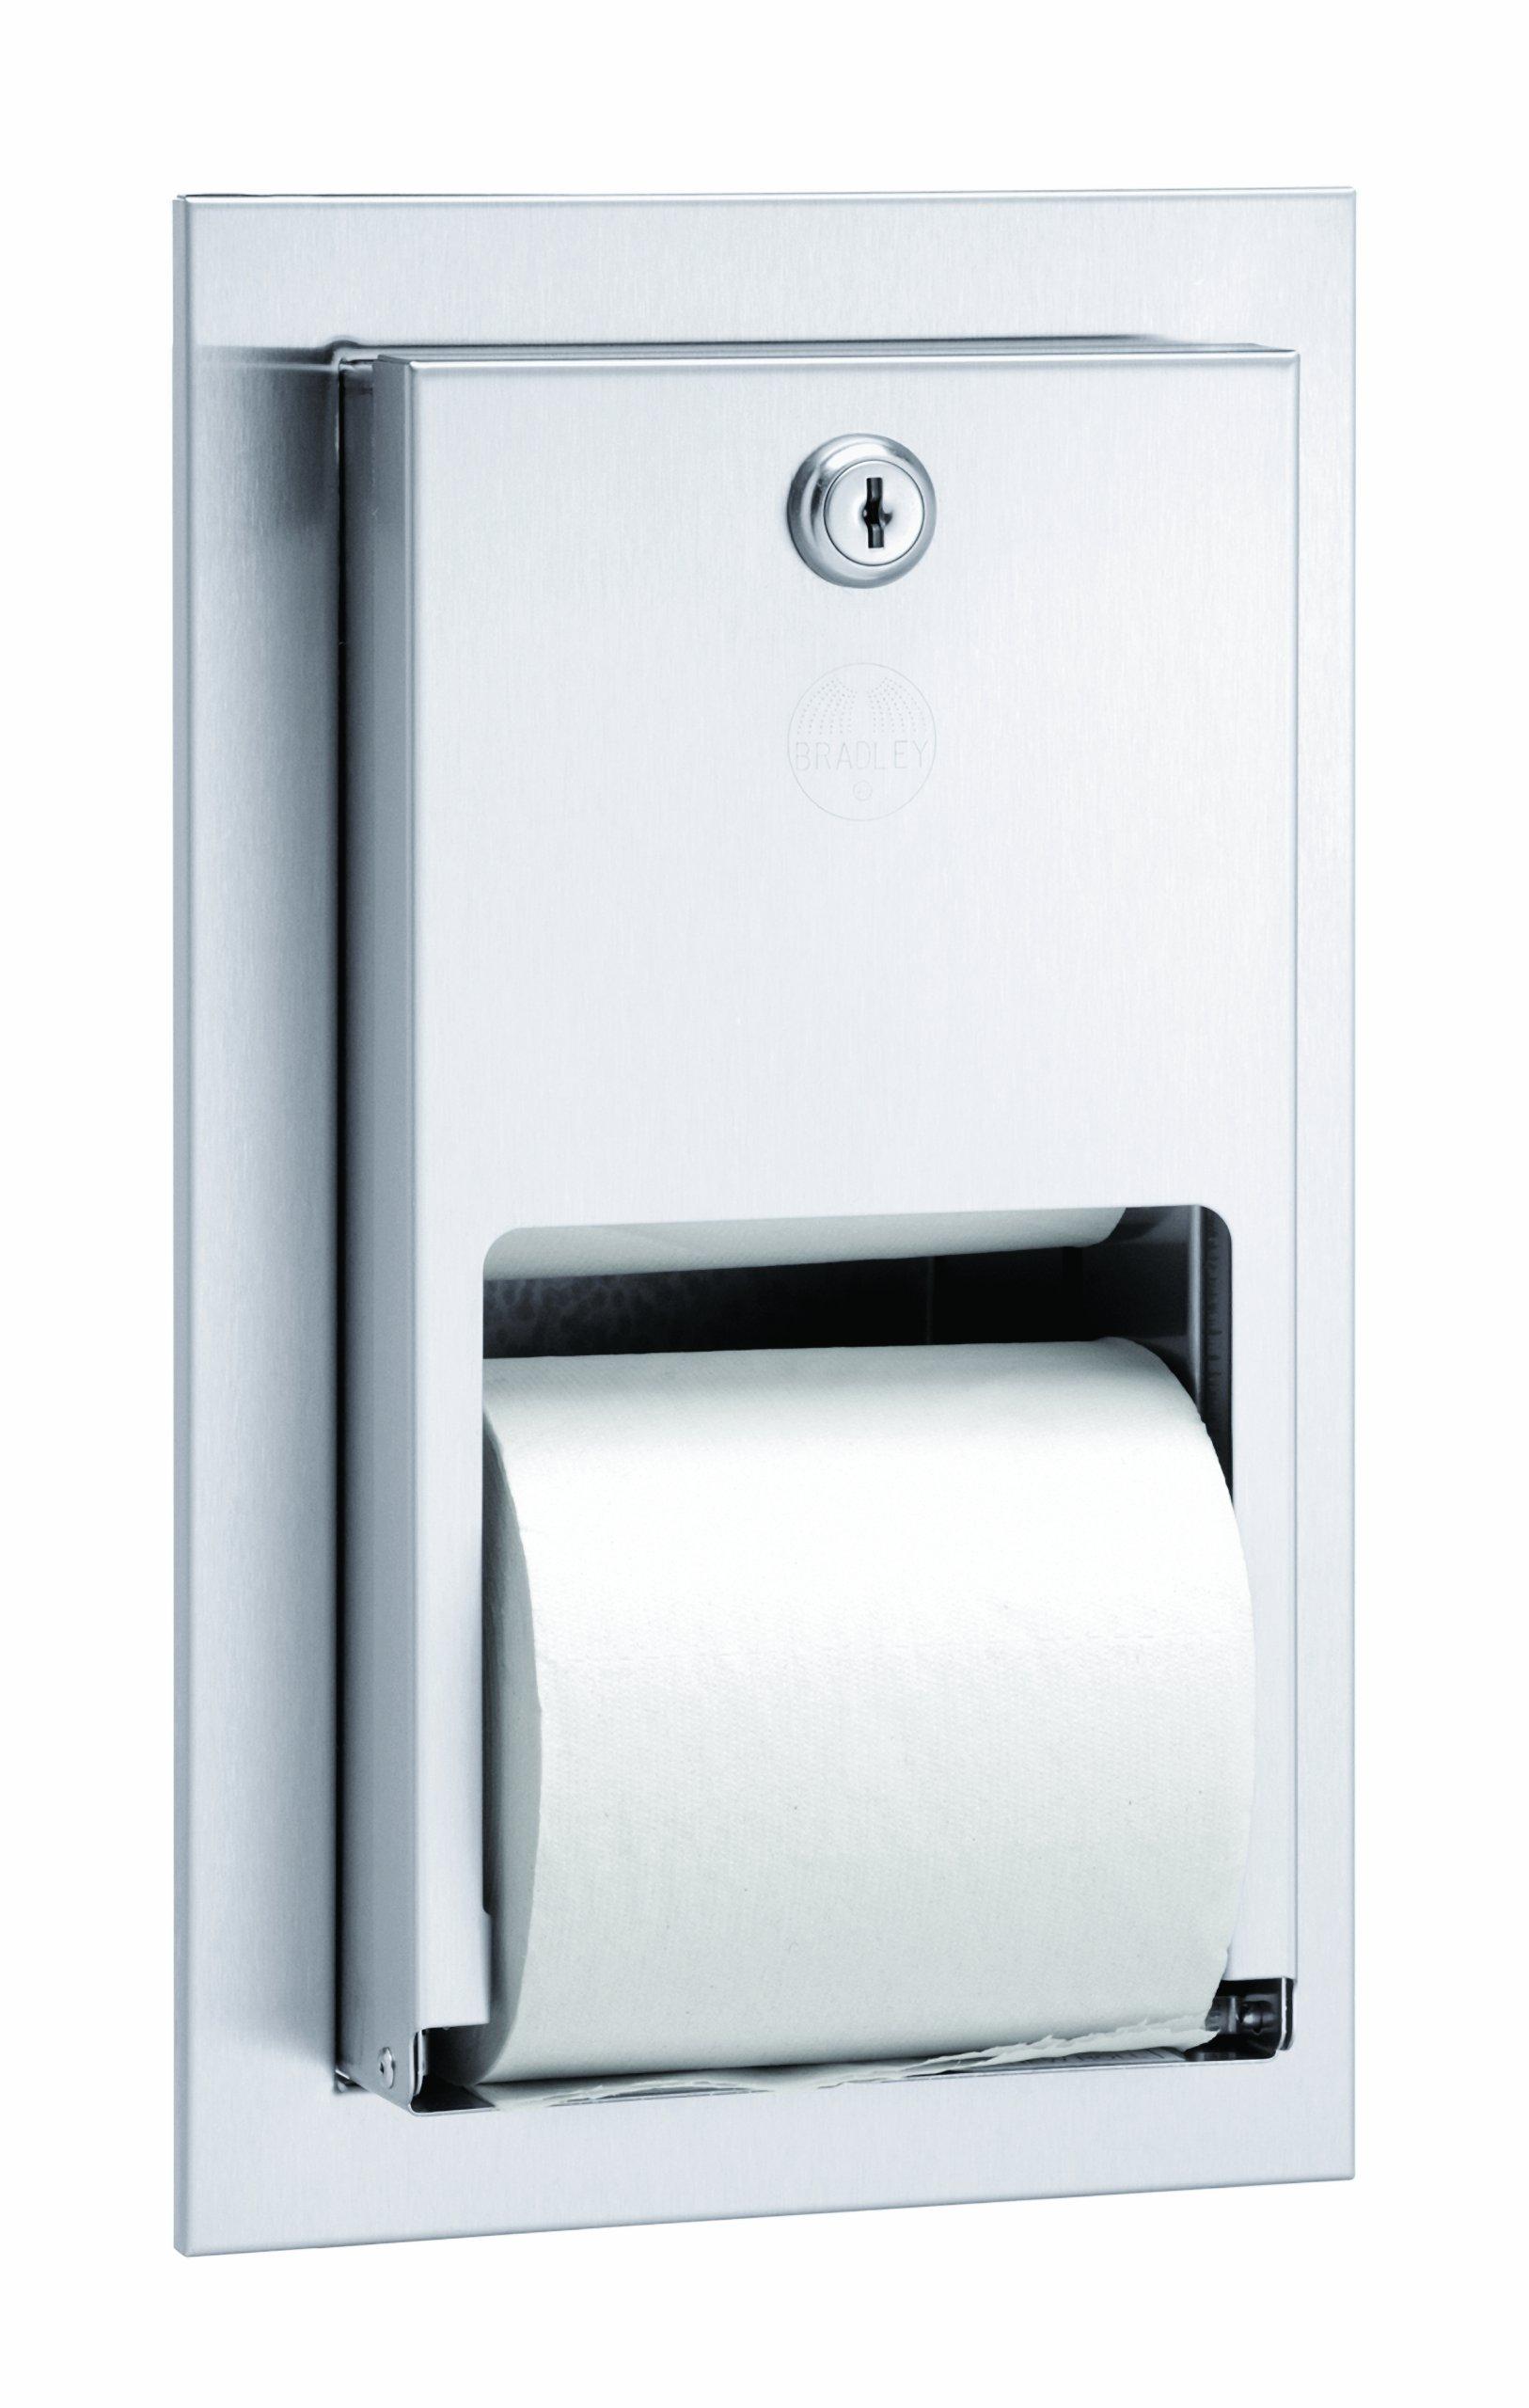 Bradley 5412-000000 22 Gauge Stainless Steel Recessed Mounted Stacking Rolls Toilet Tissue Dispenser, 5-5/8'' Width x 10-3/8'' Height x 5-5/16'' Depth by Bradley